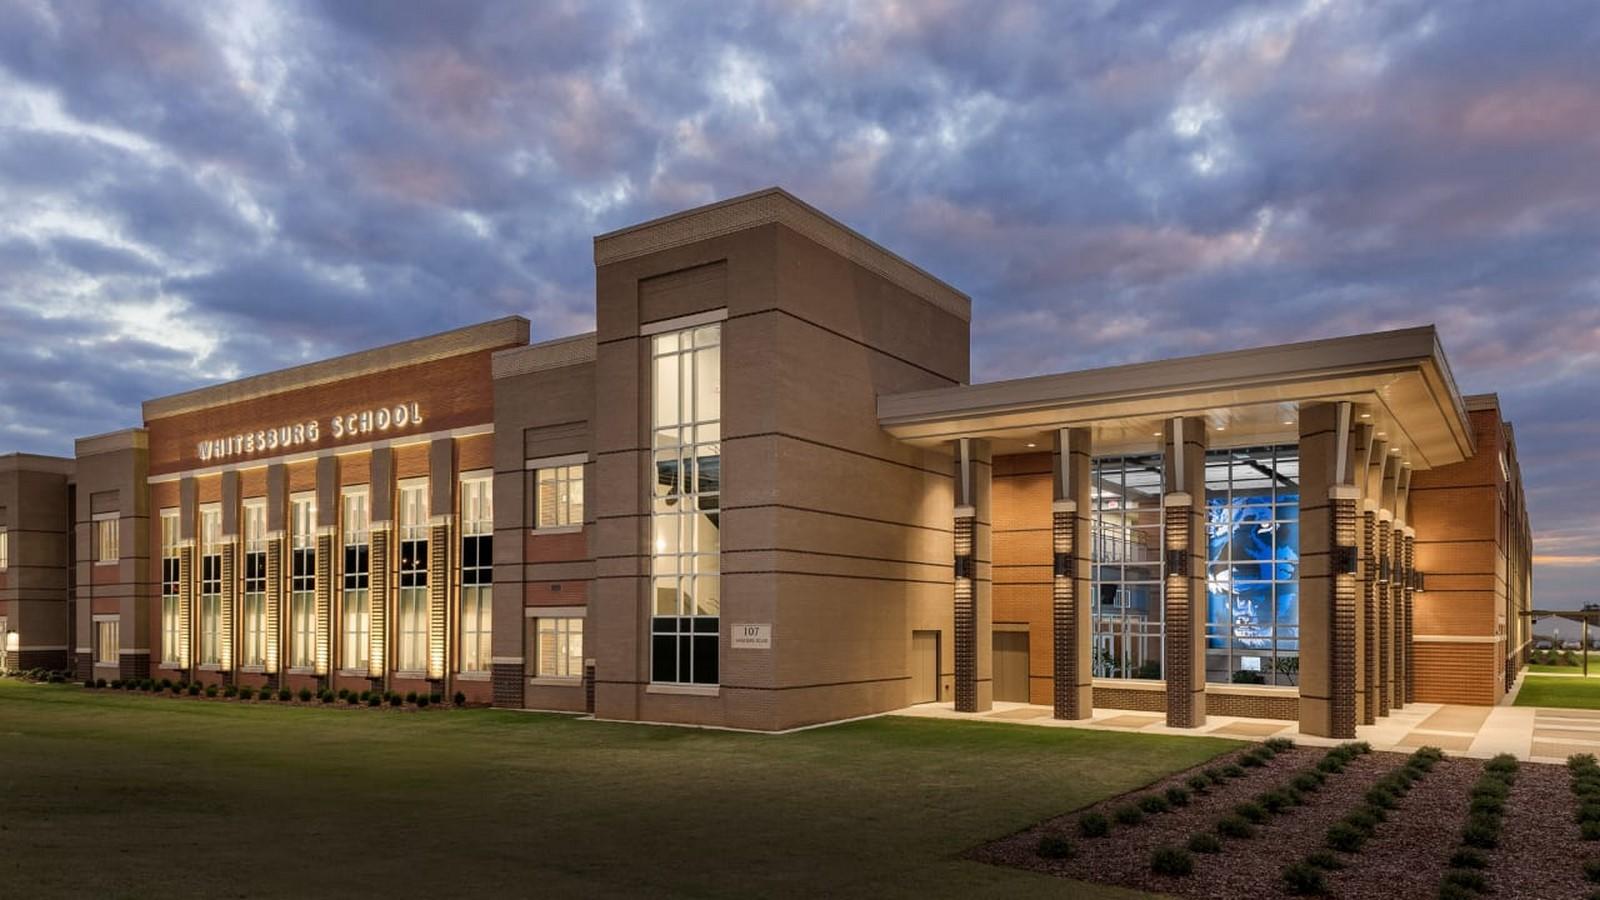 Architects in Huntsville - Top 20 Architects in Huntsville - Sheet9